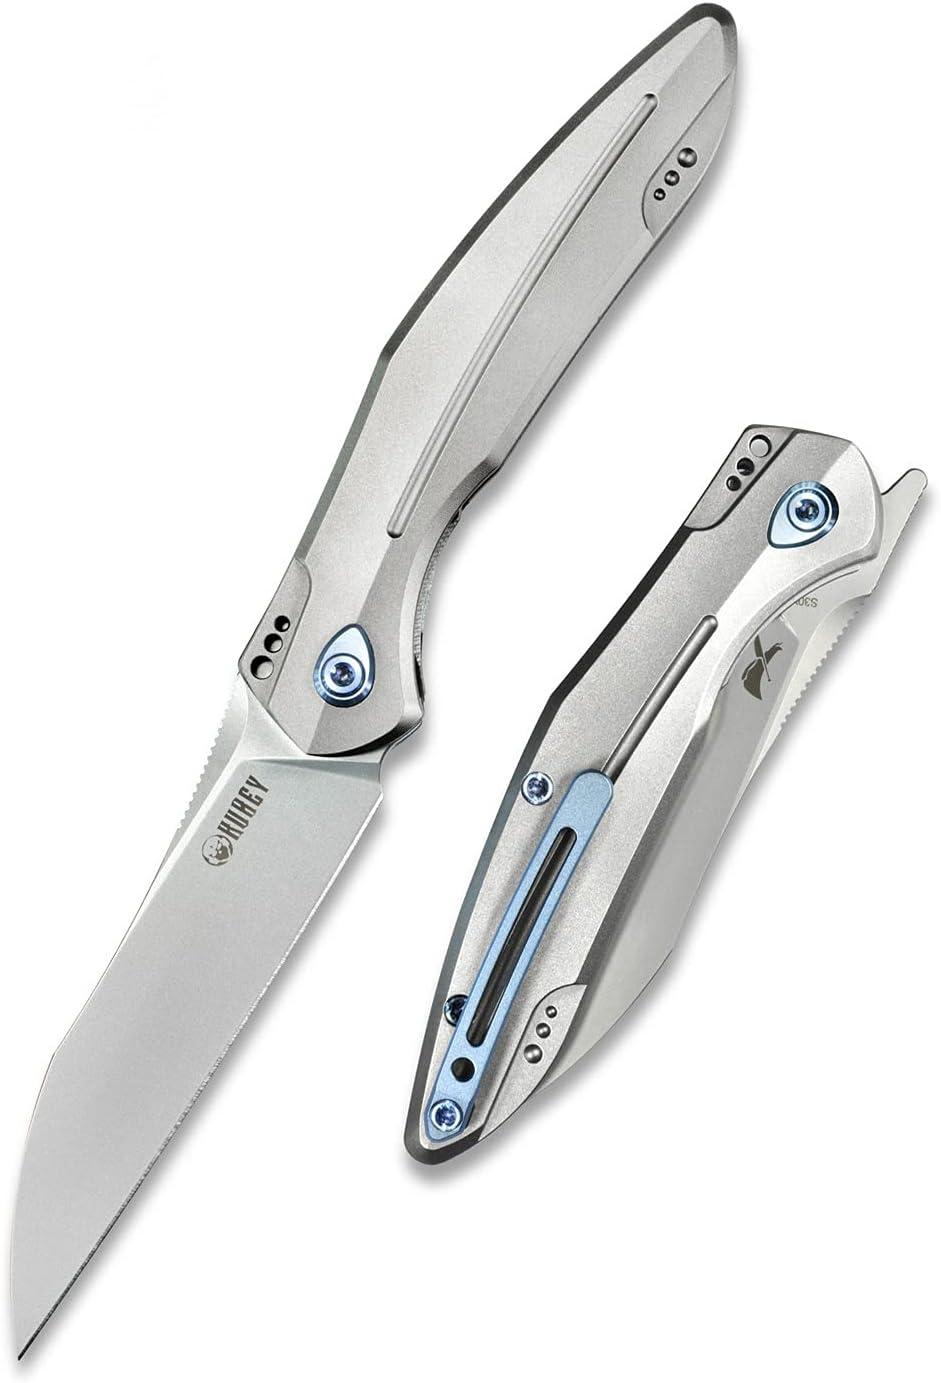 Kubey Max famous 84% OFF Barracuda KU299 Pocket Folding Knife Front Titani Flipper